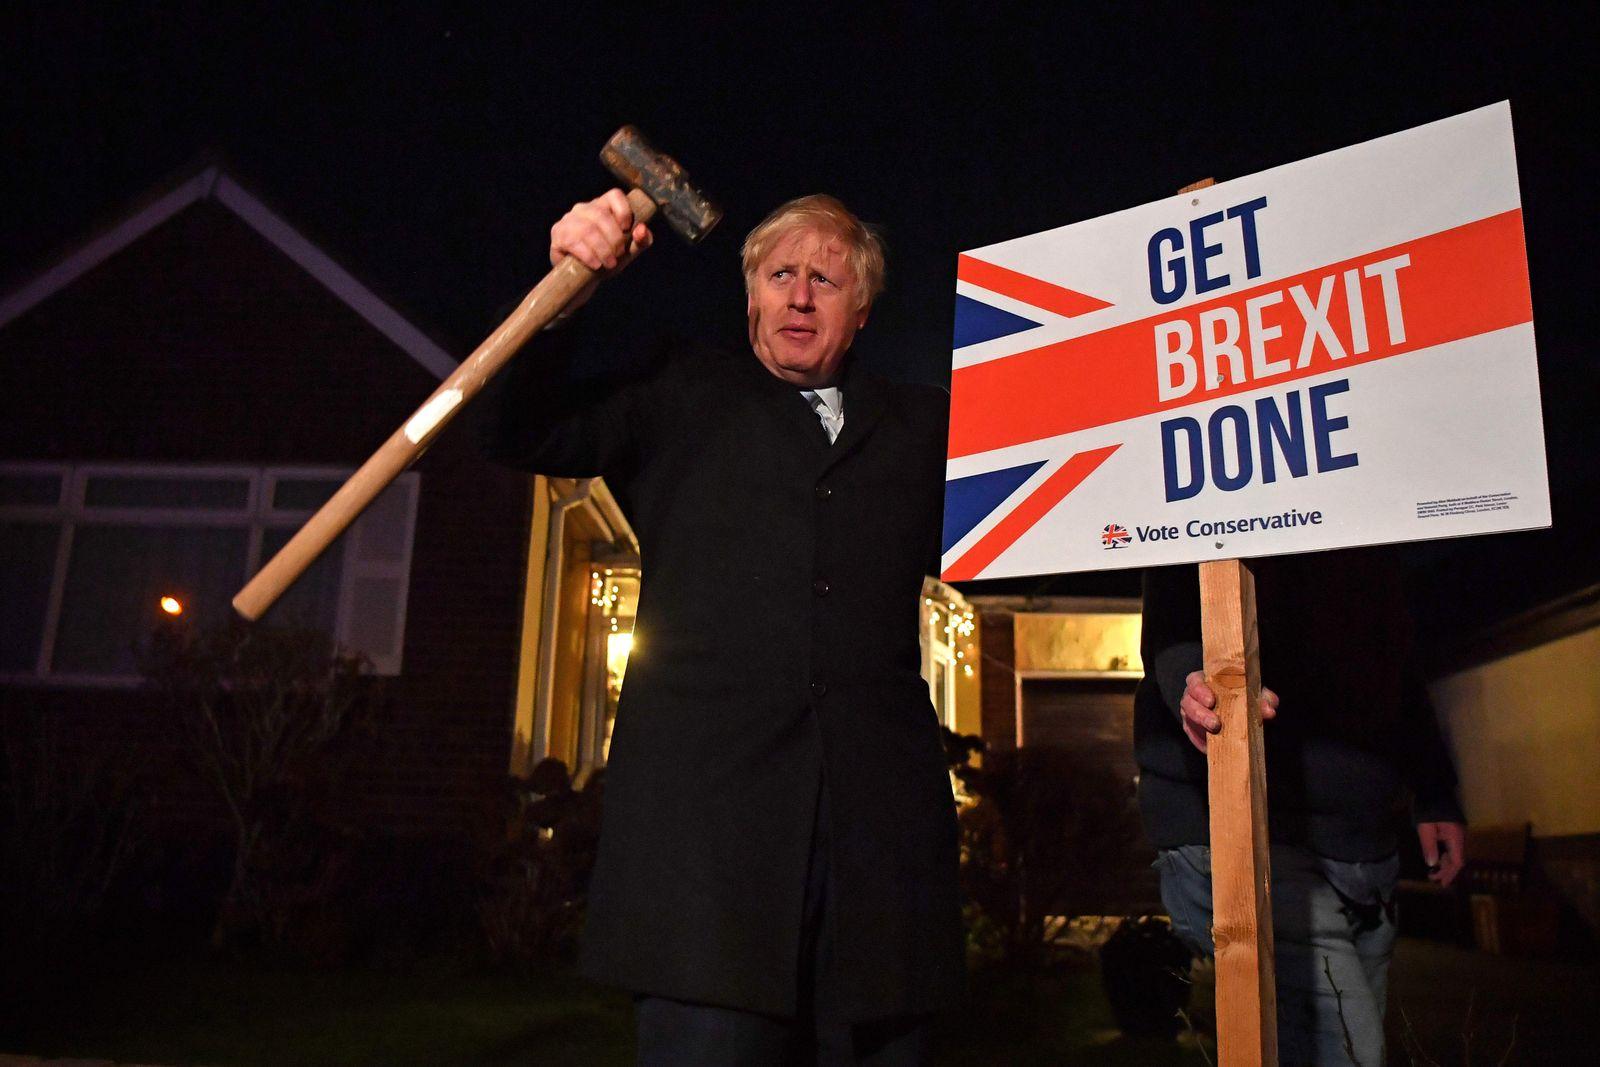 Wahlen in Großbritannien/ Brexit/ Dezember 2019